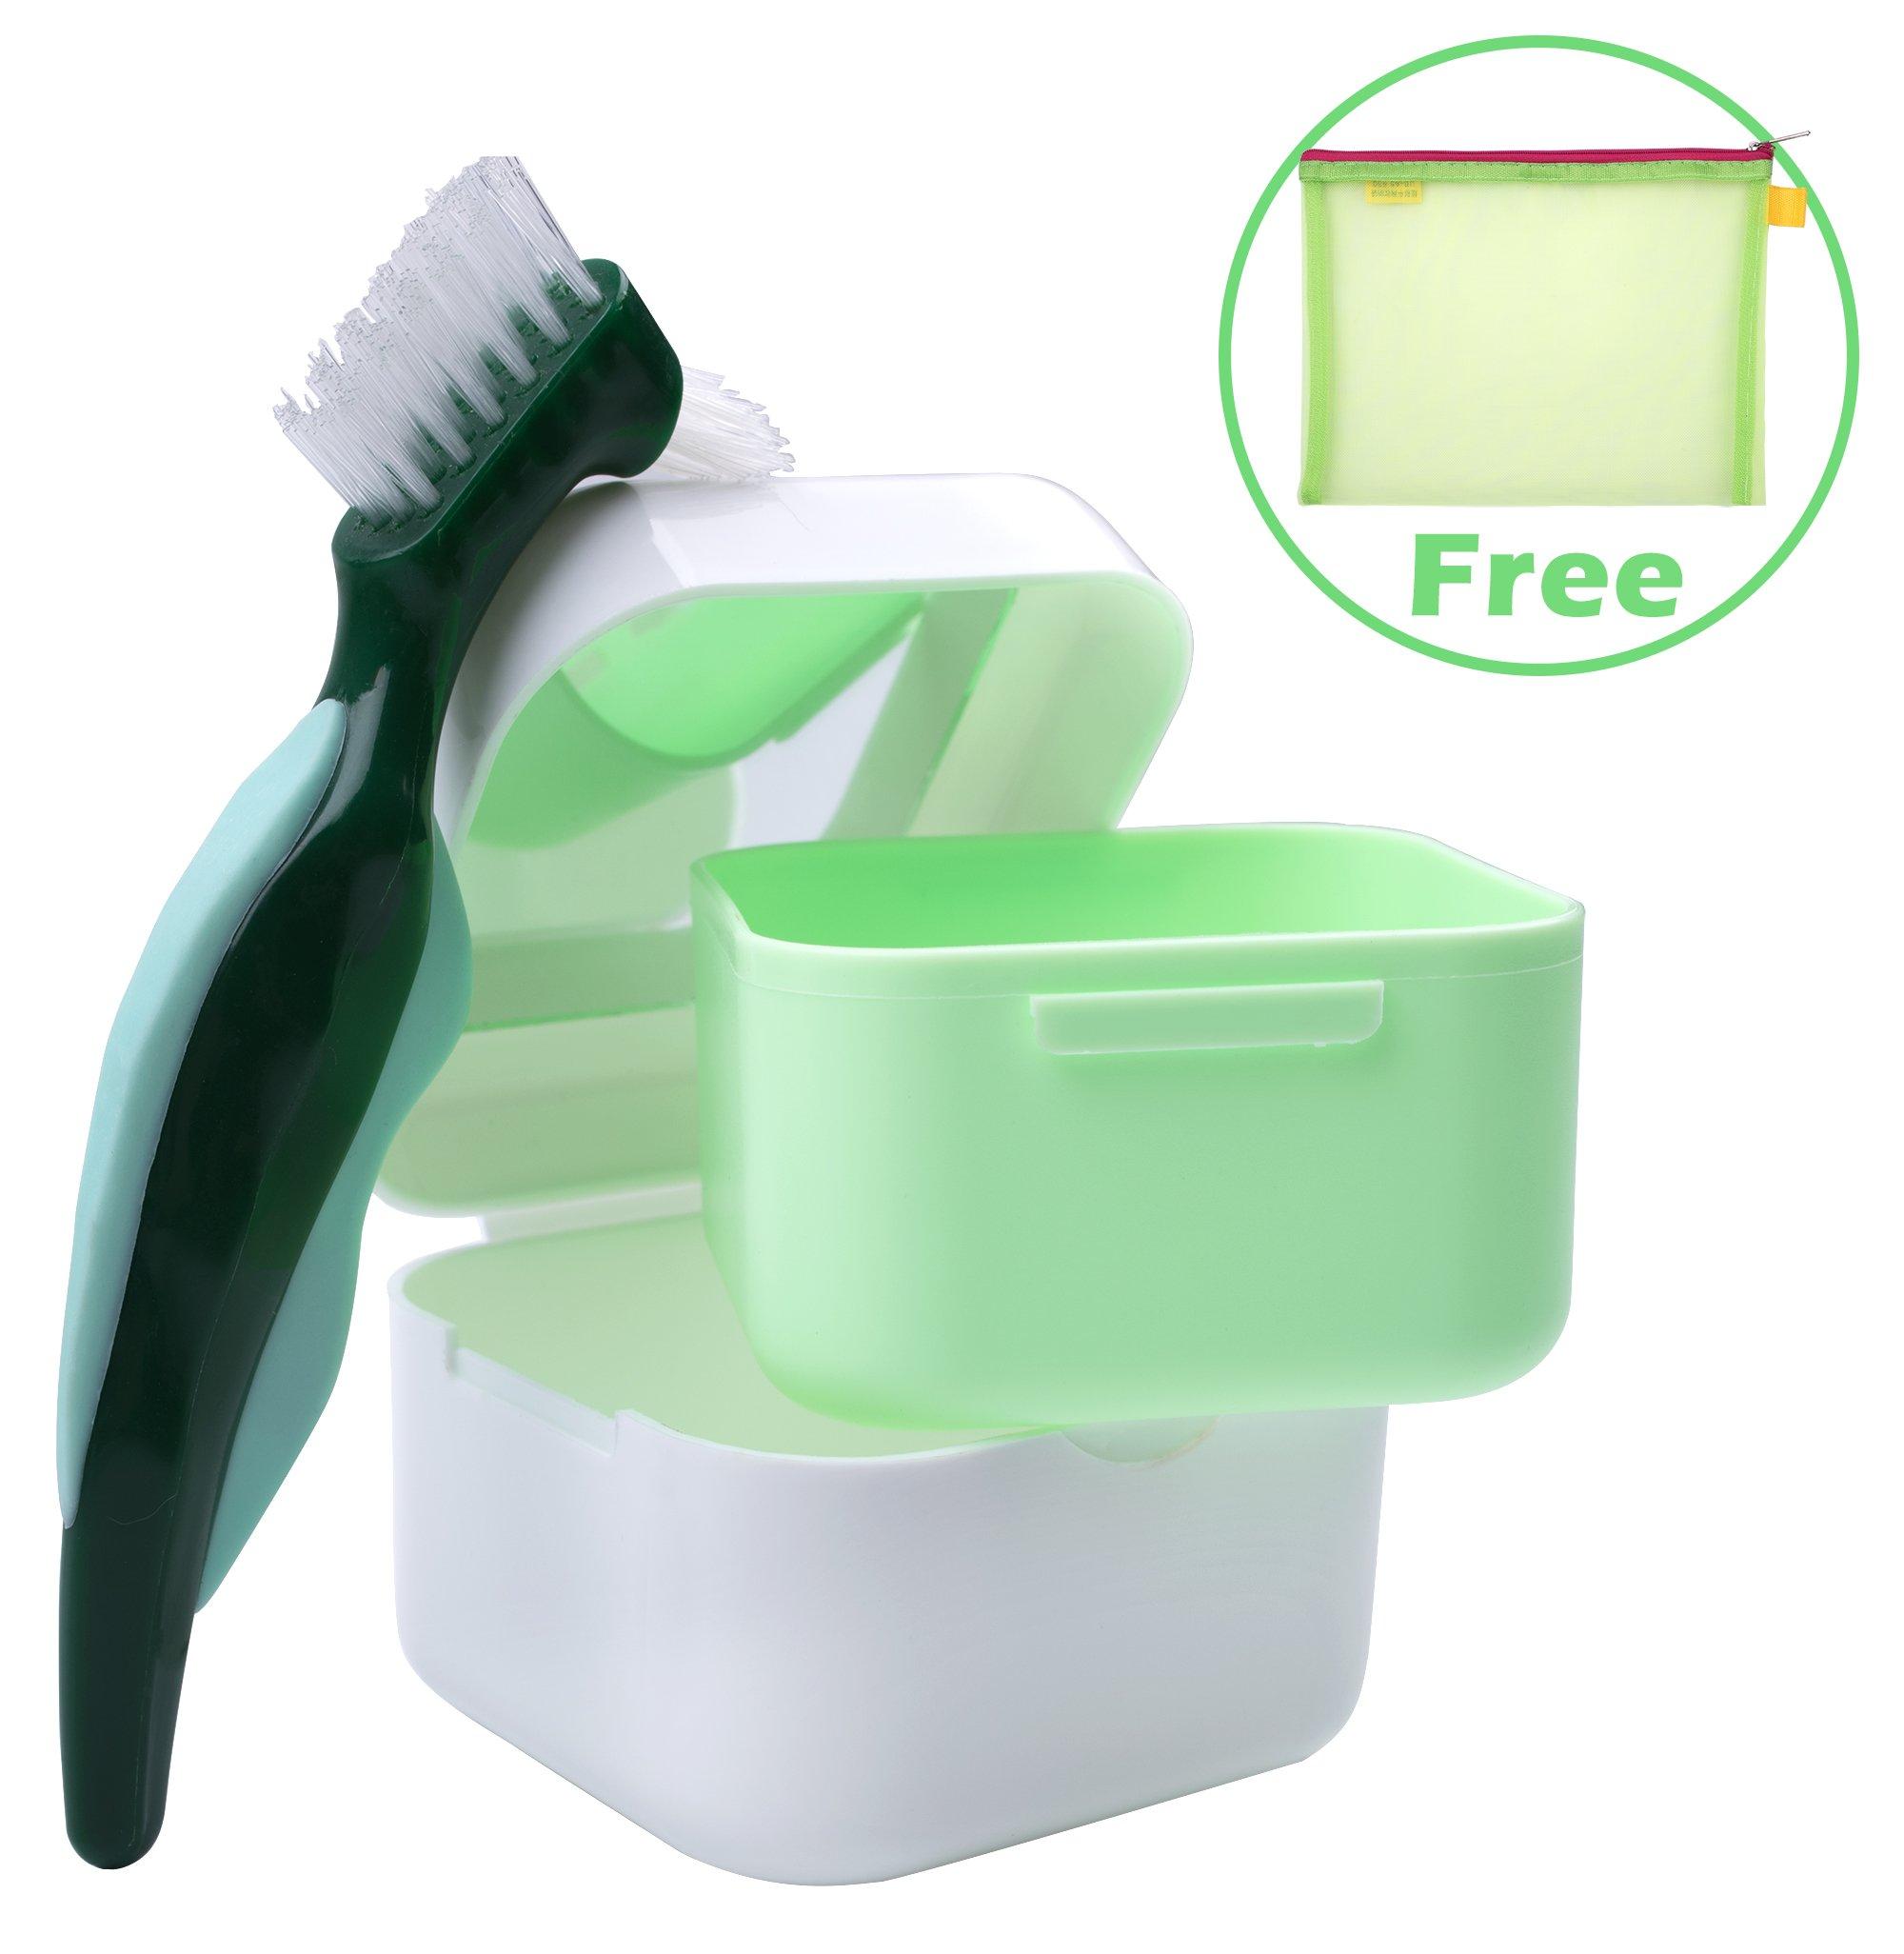 Denture Case,Denture Brush Retainer Case,Denture Cups Bath,Dentures Container with Basket Denture Holder for Travel,Retainer Cleaning Case (Green with Mirror)